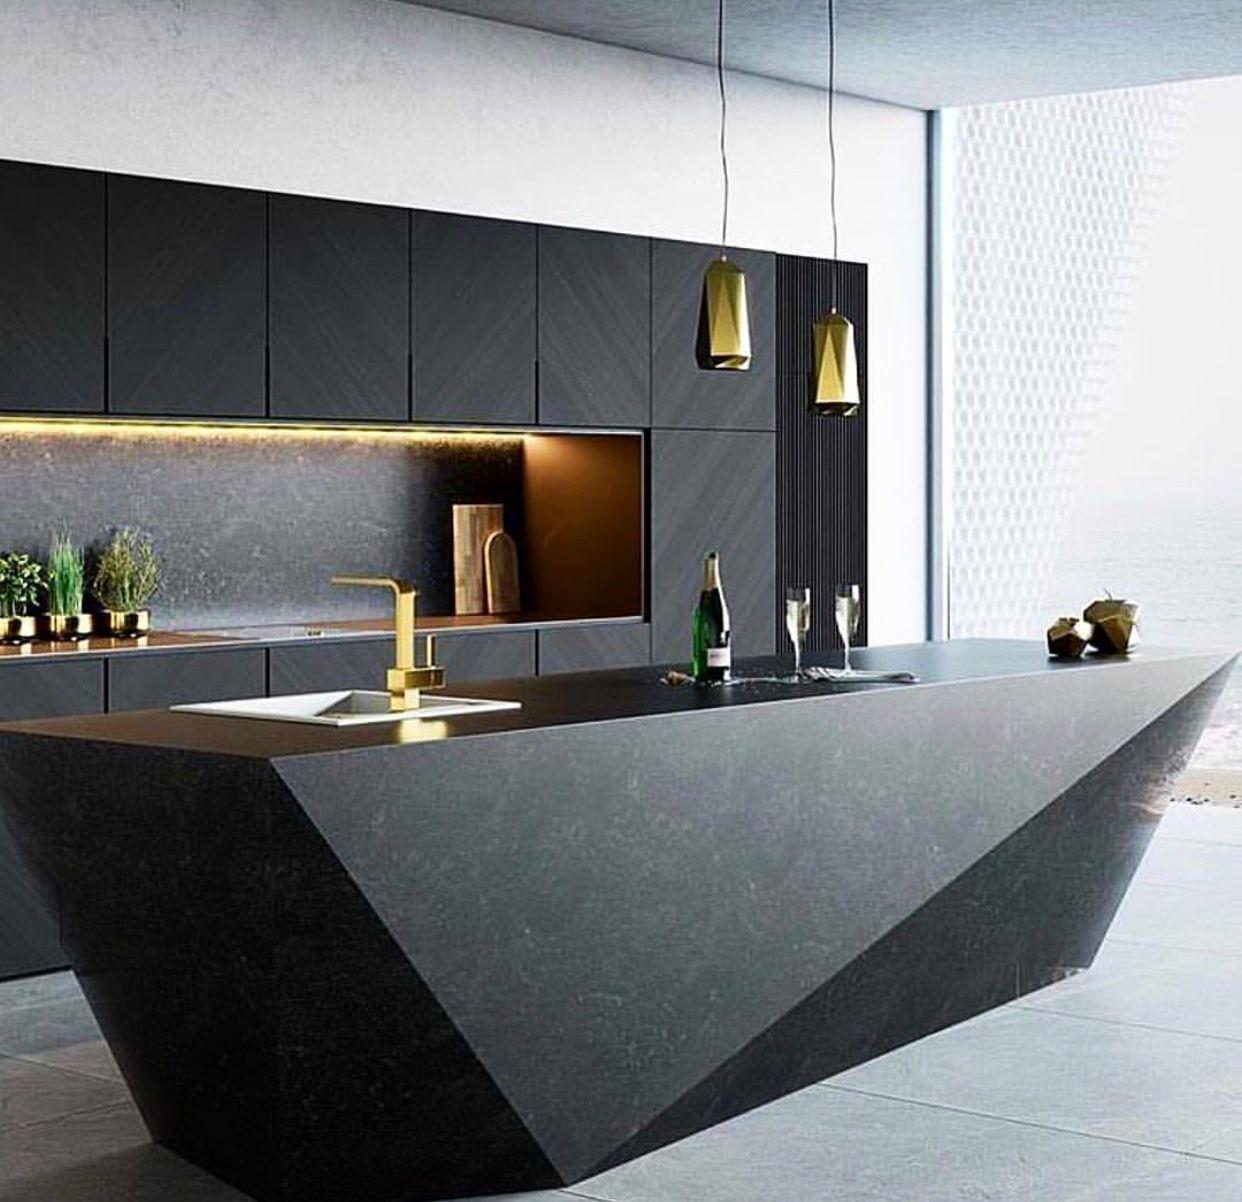 Modern Matte Black Kitchen With Gold Finishes Luxury Kitchen Design Kitchen Room Design Modern Kitchen Design